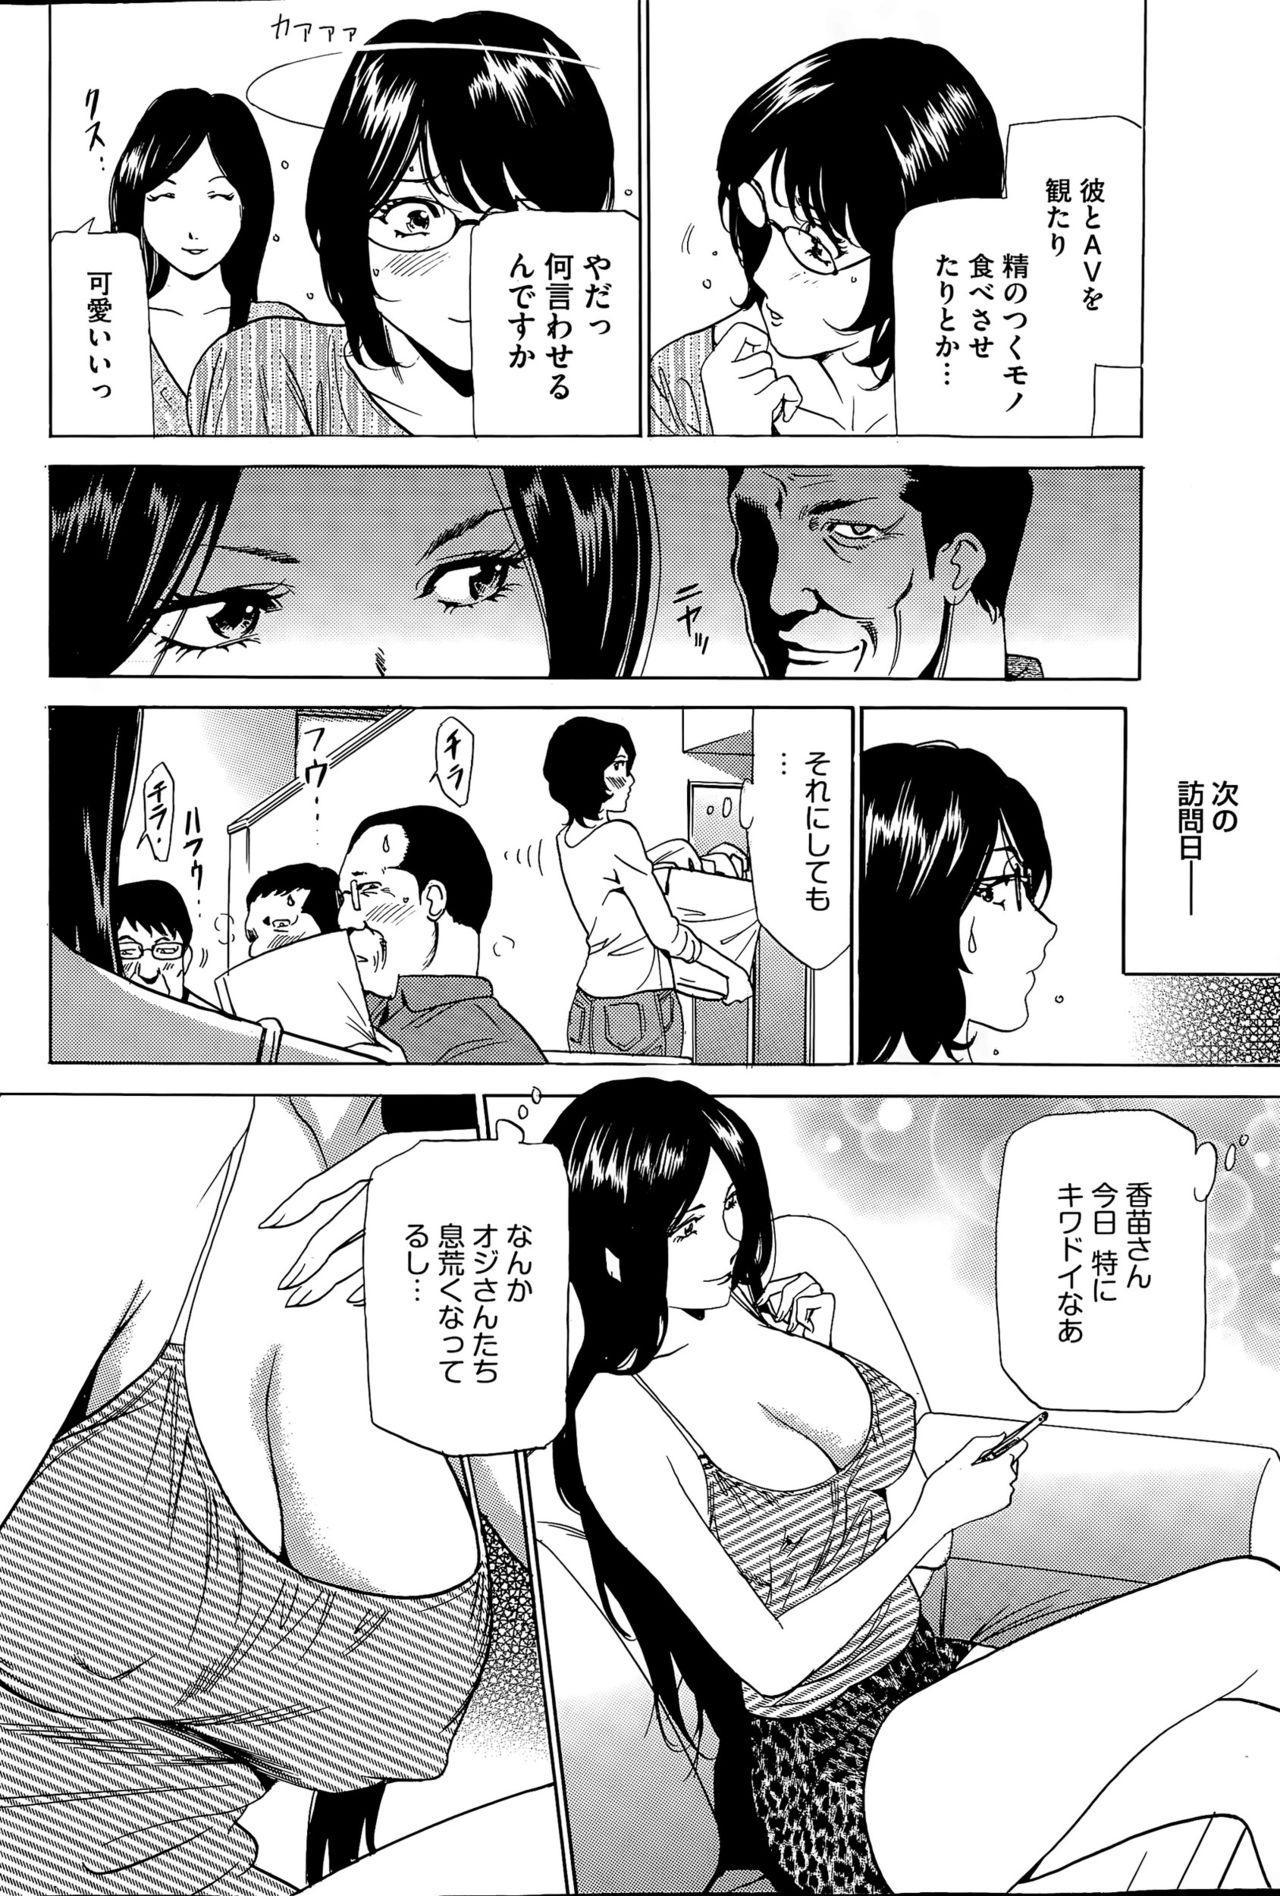 Wa Usuki Ipa a 1-10 6